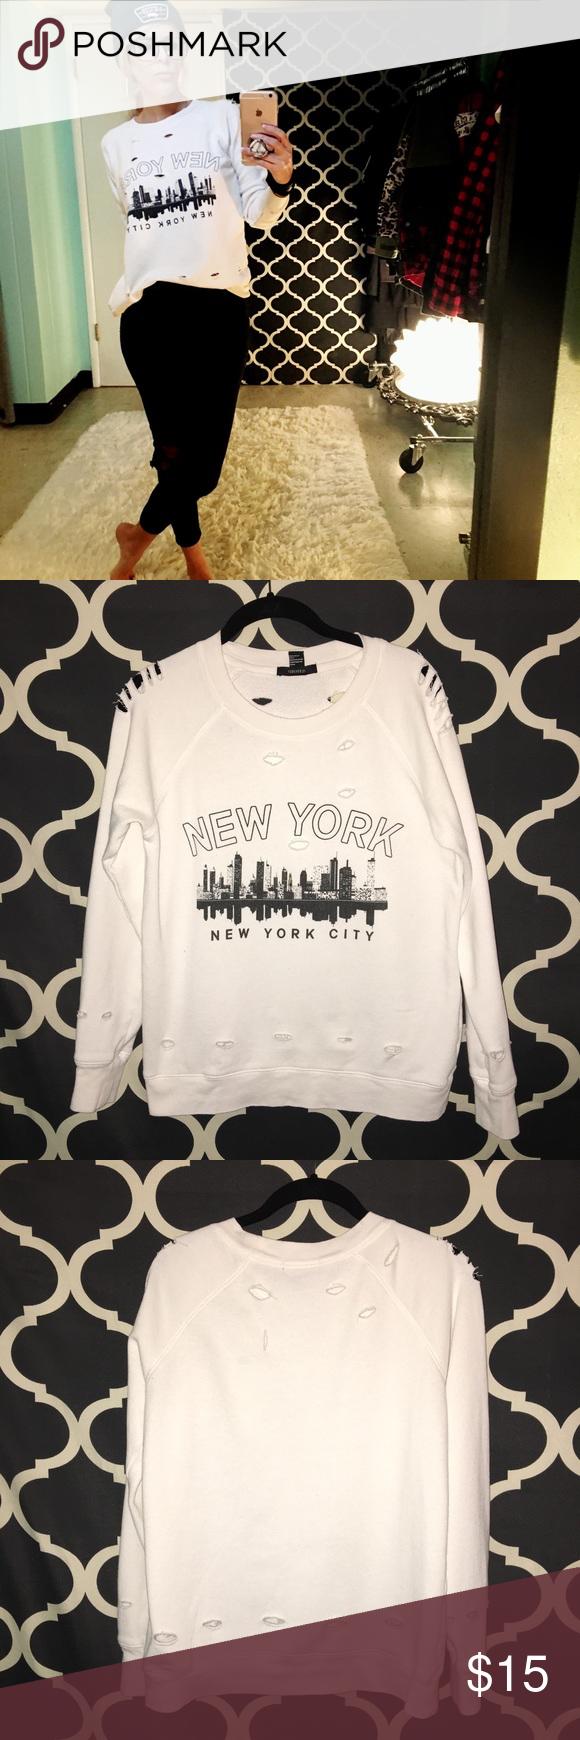 Forever 21, New York City Sweatshirt Forever 21, New York City sweatshirt. Holes all over garment. Care tag missing, Forever 21 Tops Sweatshirts & Hoodies